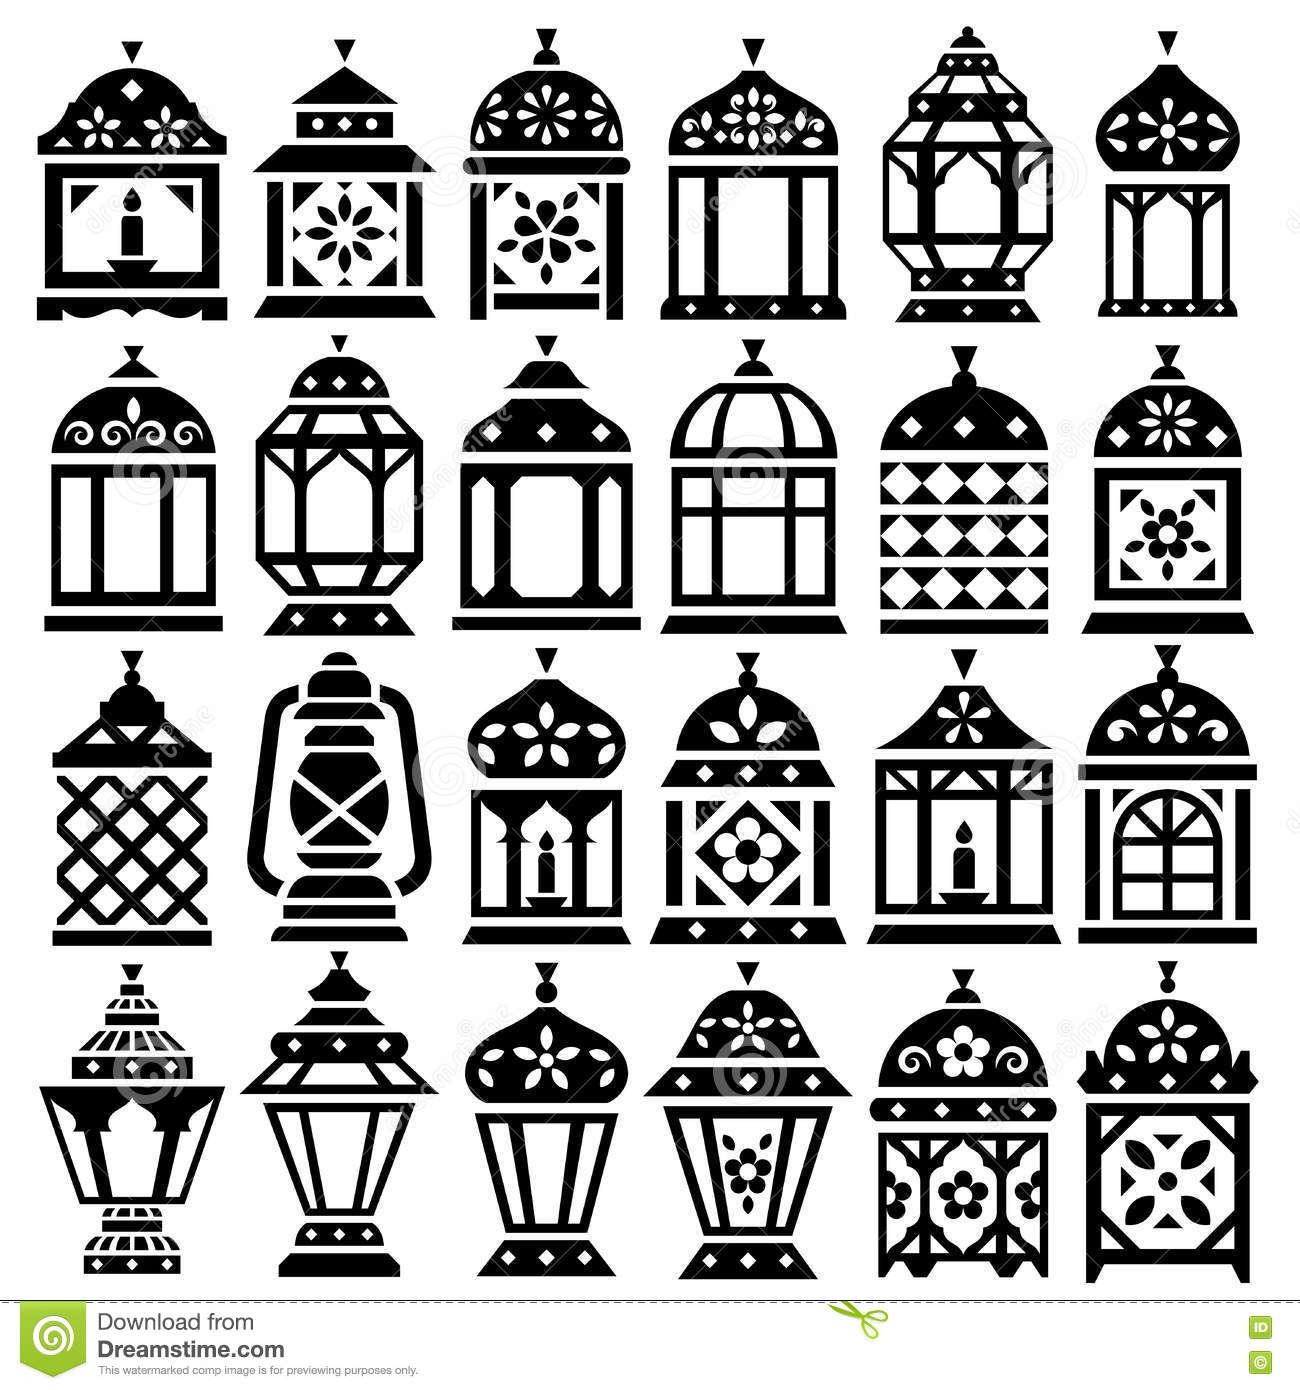 2d lantern template  Image result for lantern 7d | Ramadan lantern, Ramadan, Lanterns